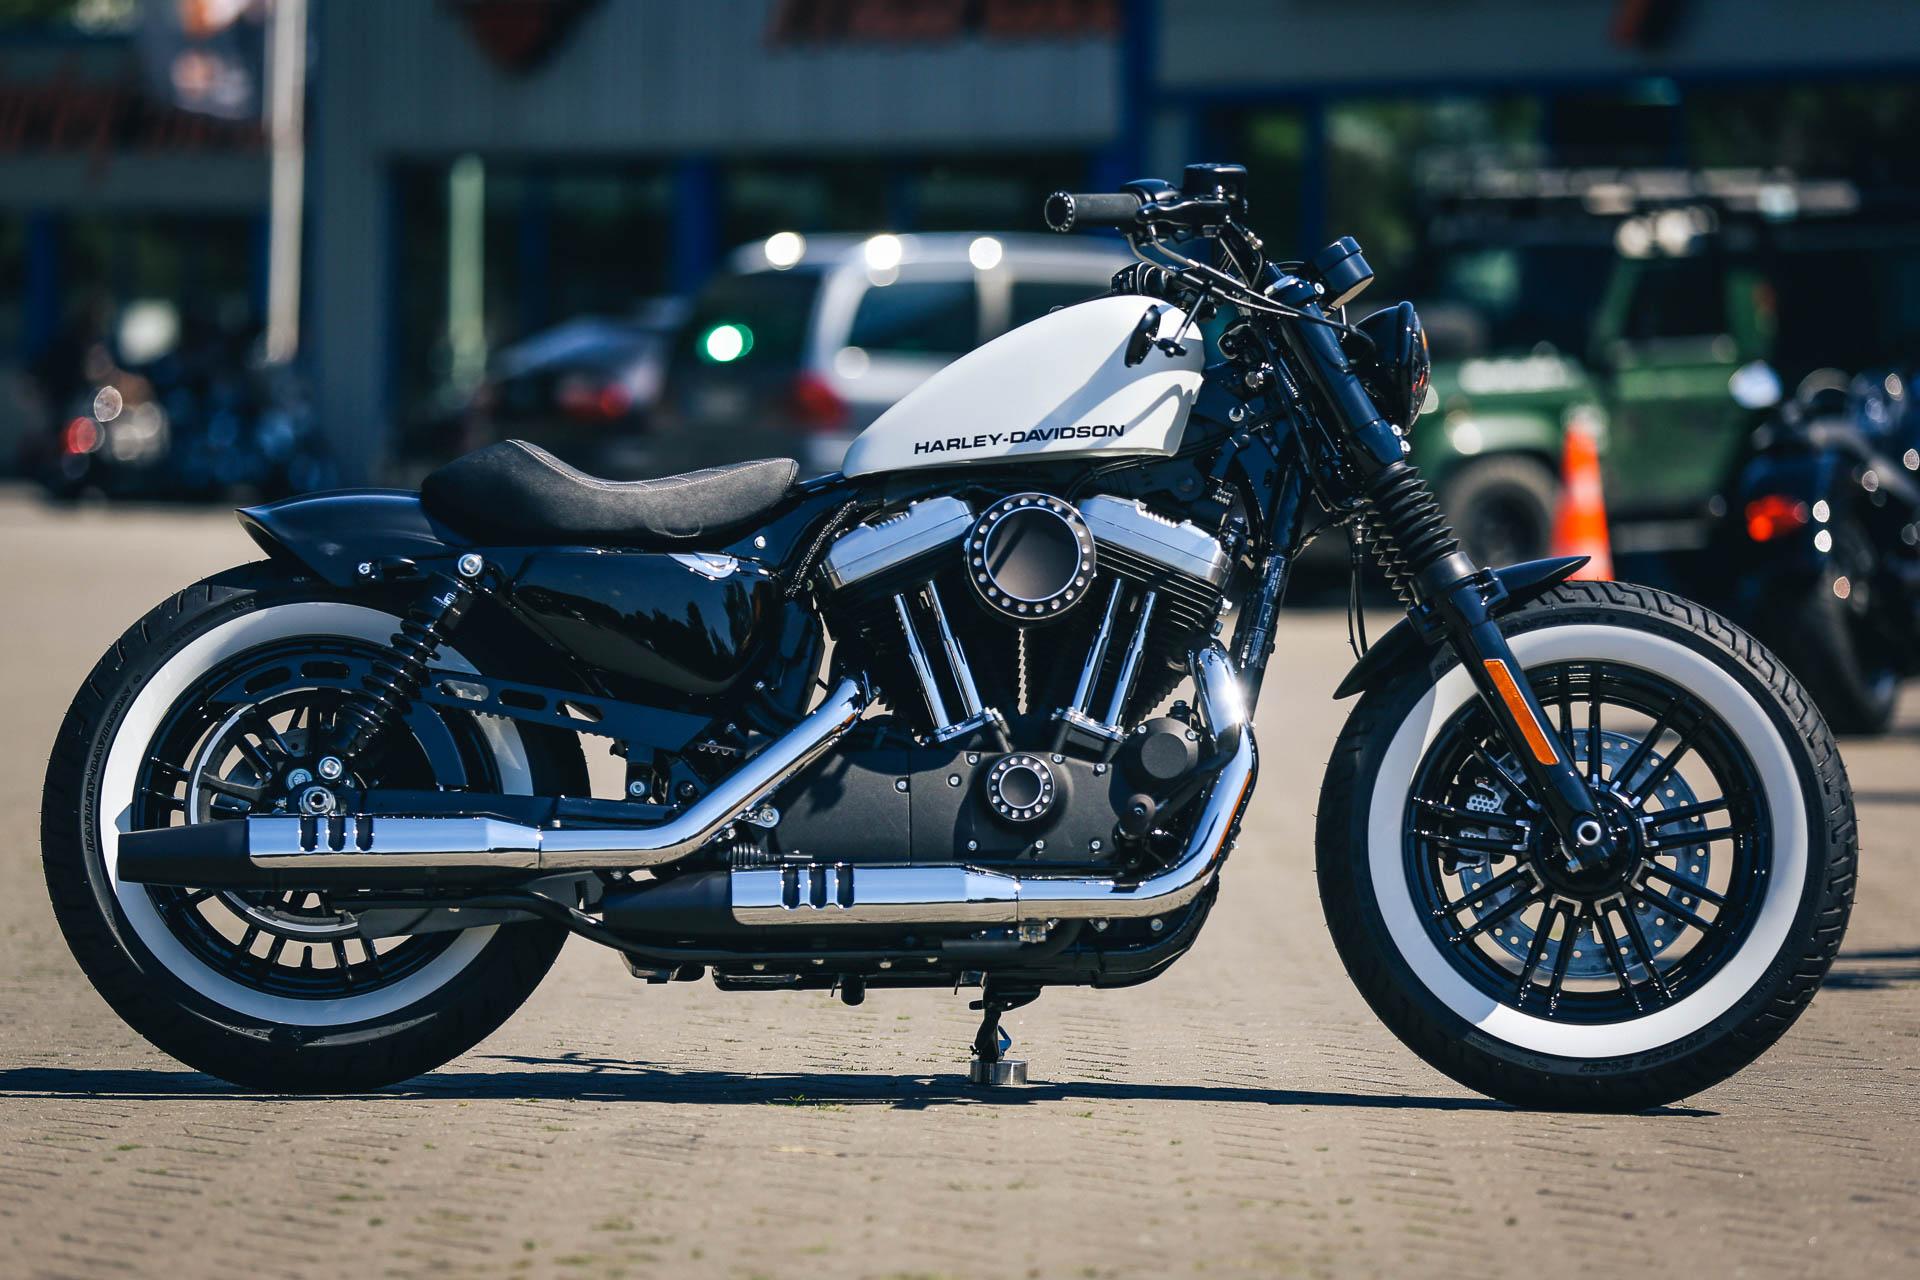 Thunderbike Whitesky H D Forty Eight Xl1200x Sportster Umbau